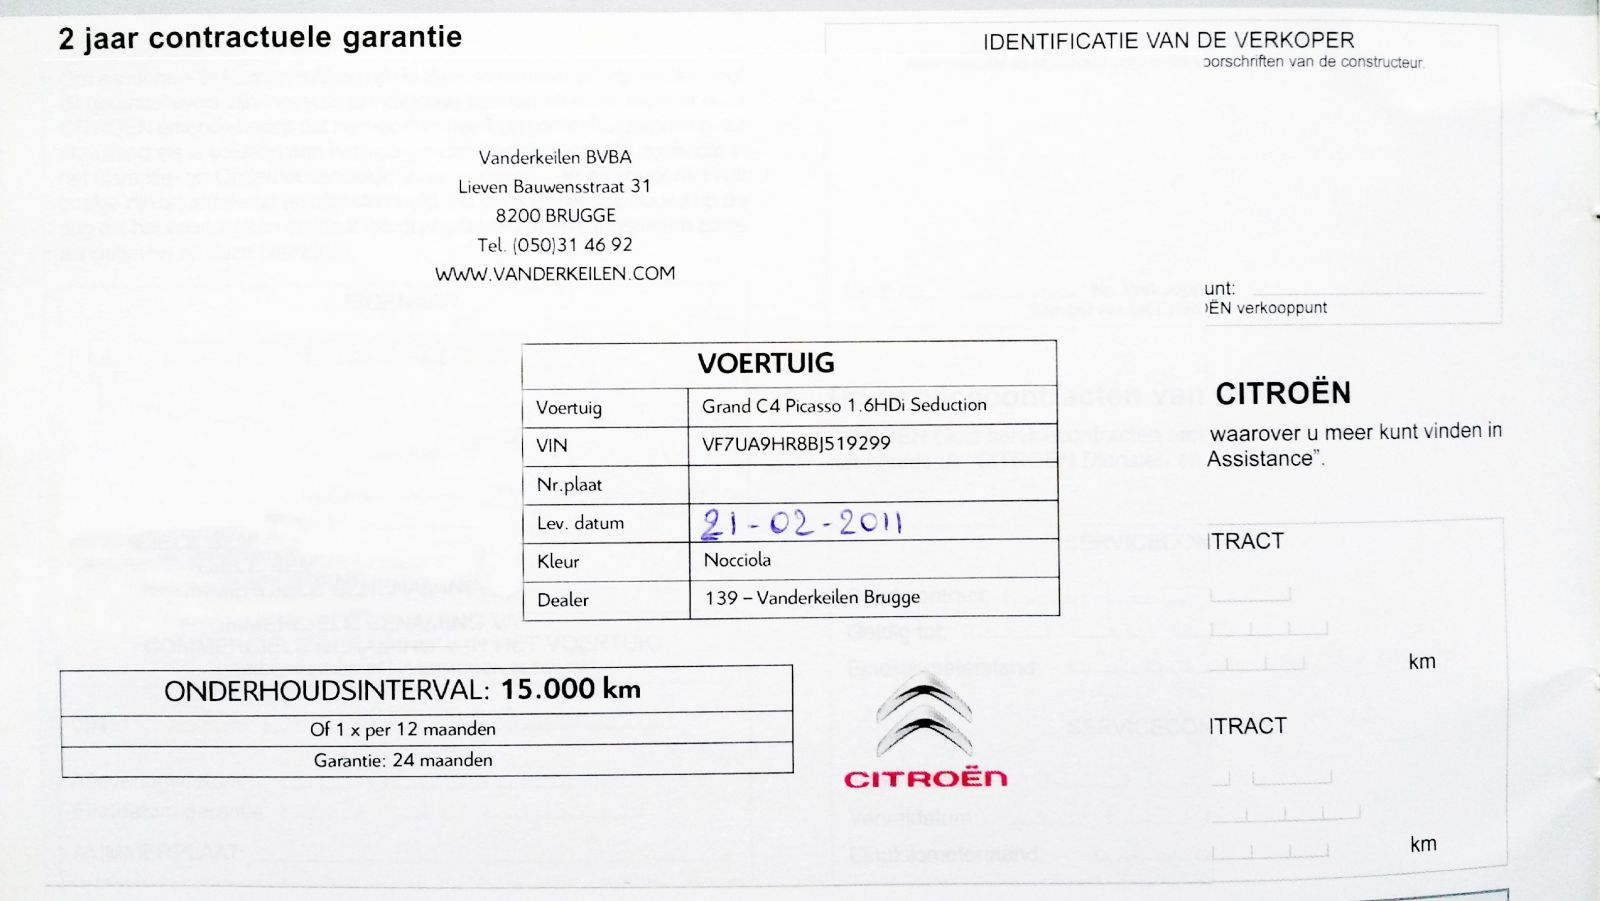 Интервал обслуживания DV6 C4 Grand Picasso 1.6 HDI euro5